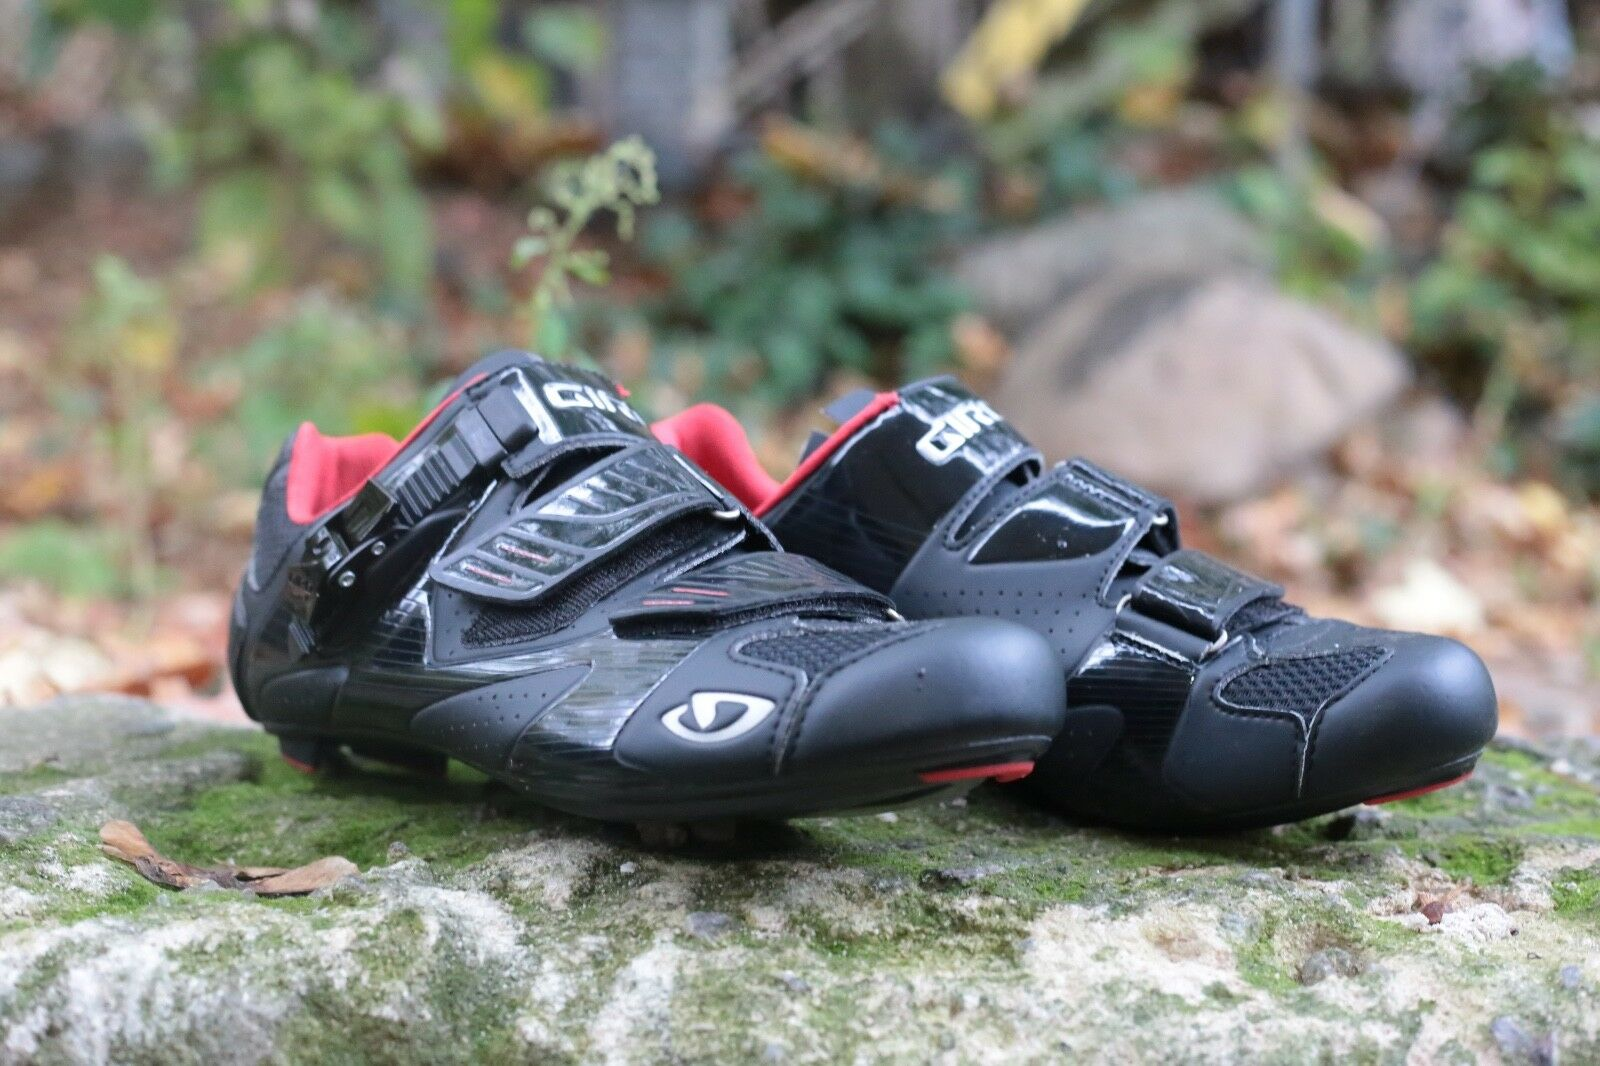 Nuevos Zapatos de ciclismo Giro factor 42.5. Suela de carbono